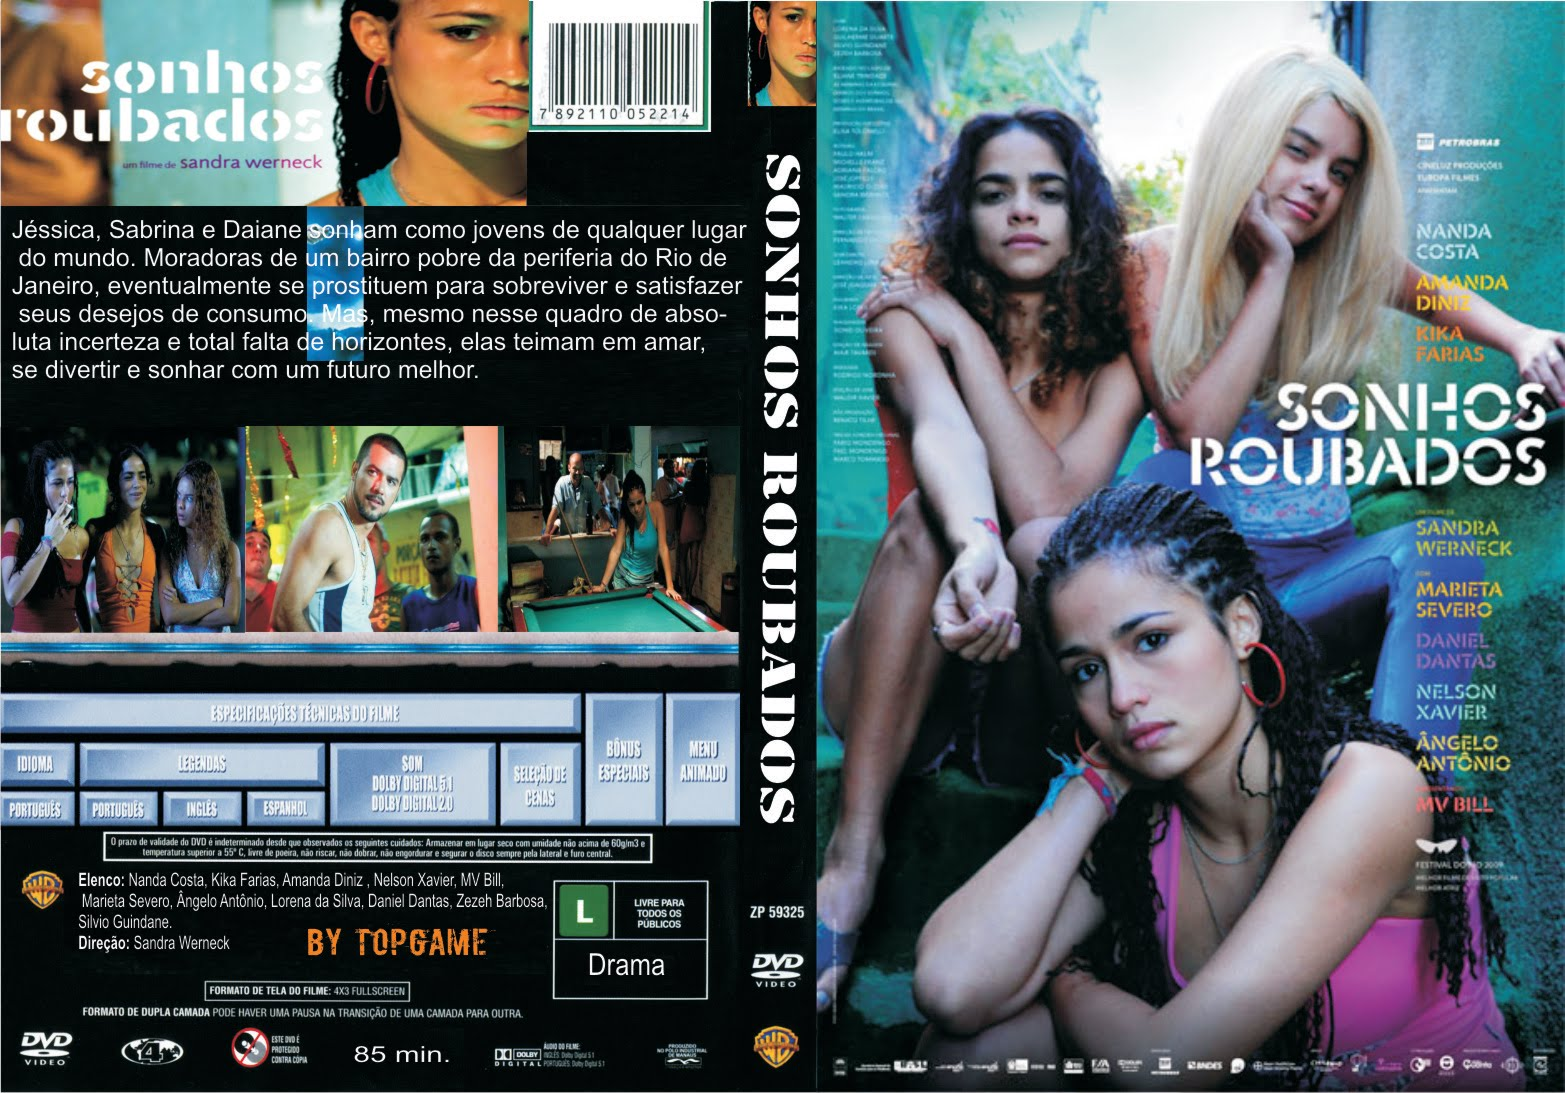 http://3.bp.blogspot.com/_WHxjd2HO-SQ/S_5orc7dnOI/AAAAAAAAAsE/uQrTuwFqGFo/s1600/Sonhos-Roubados1.jpg